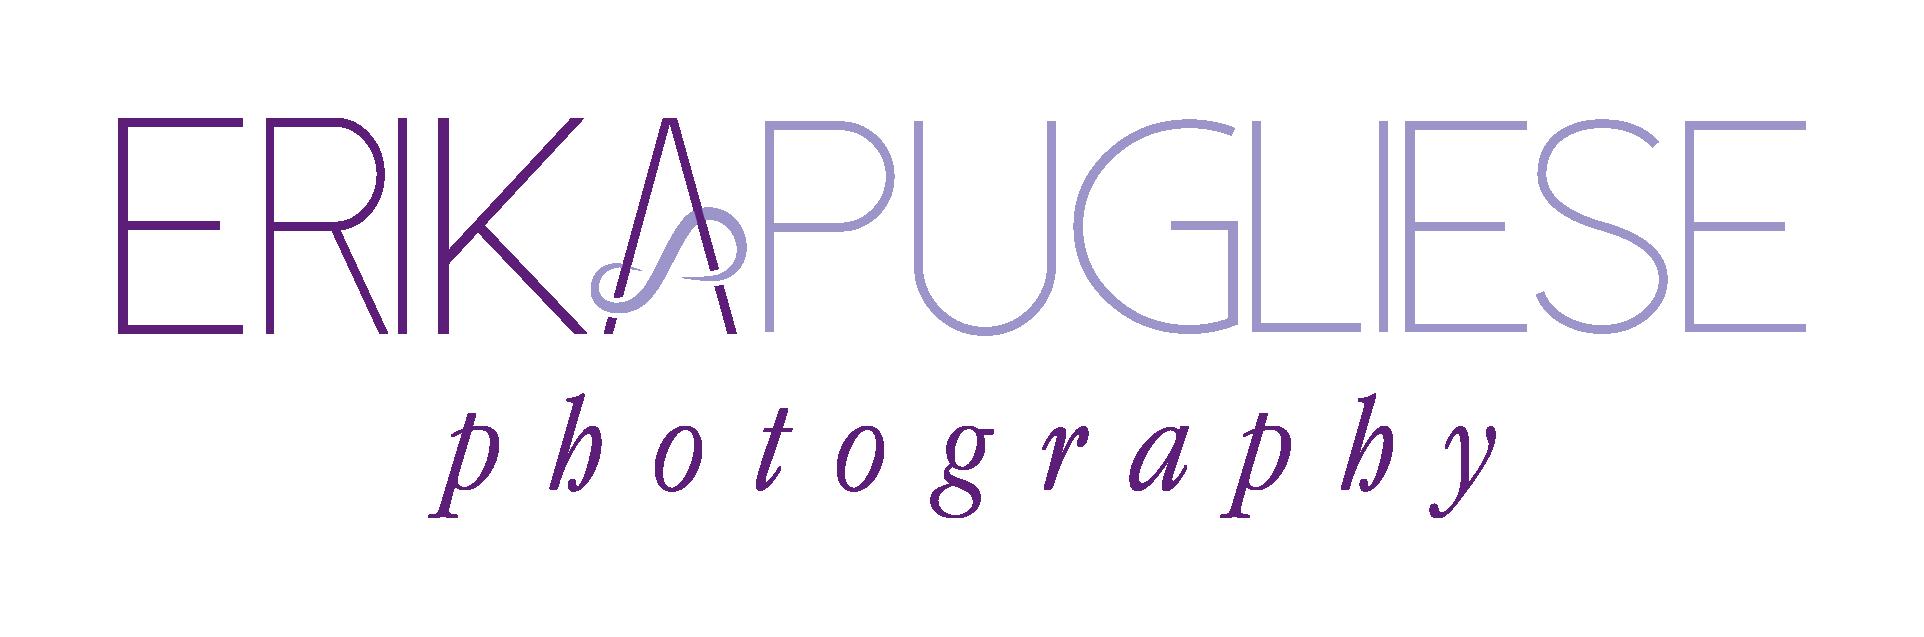 Logotipo de Erika Pugliese